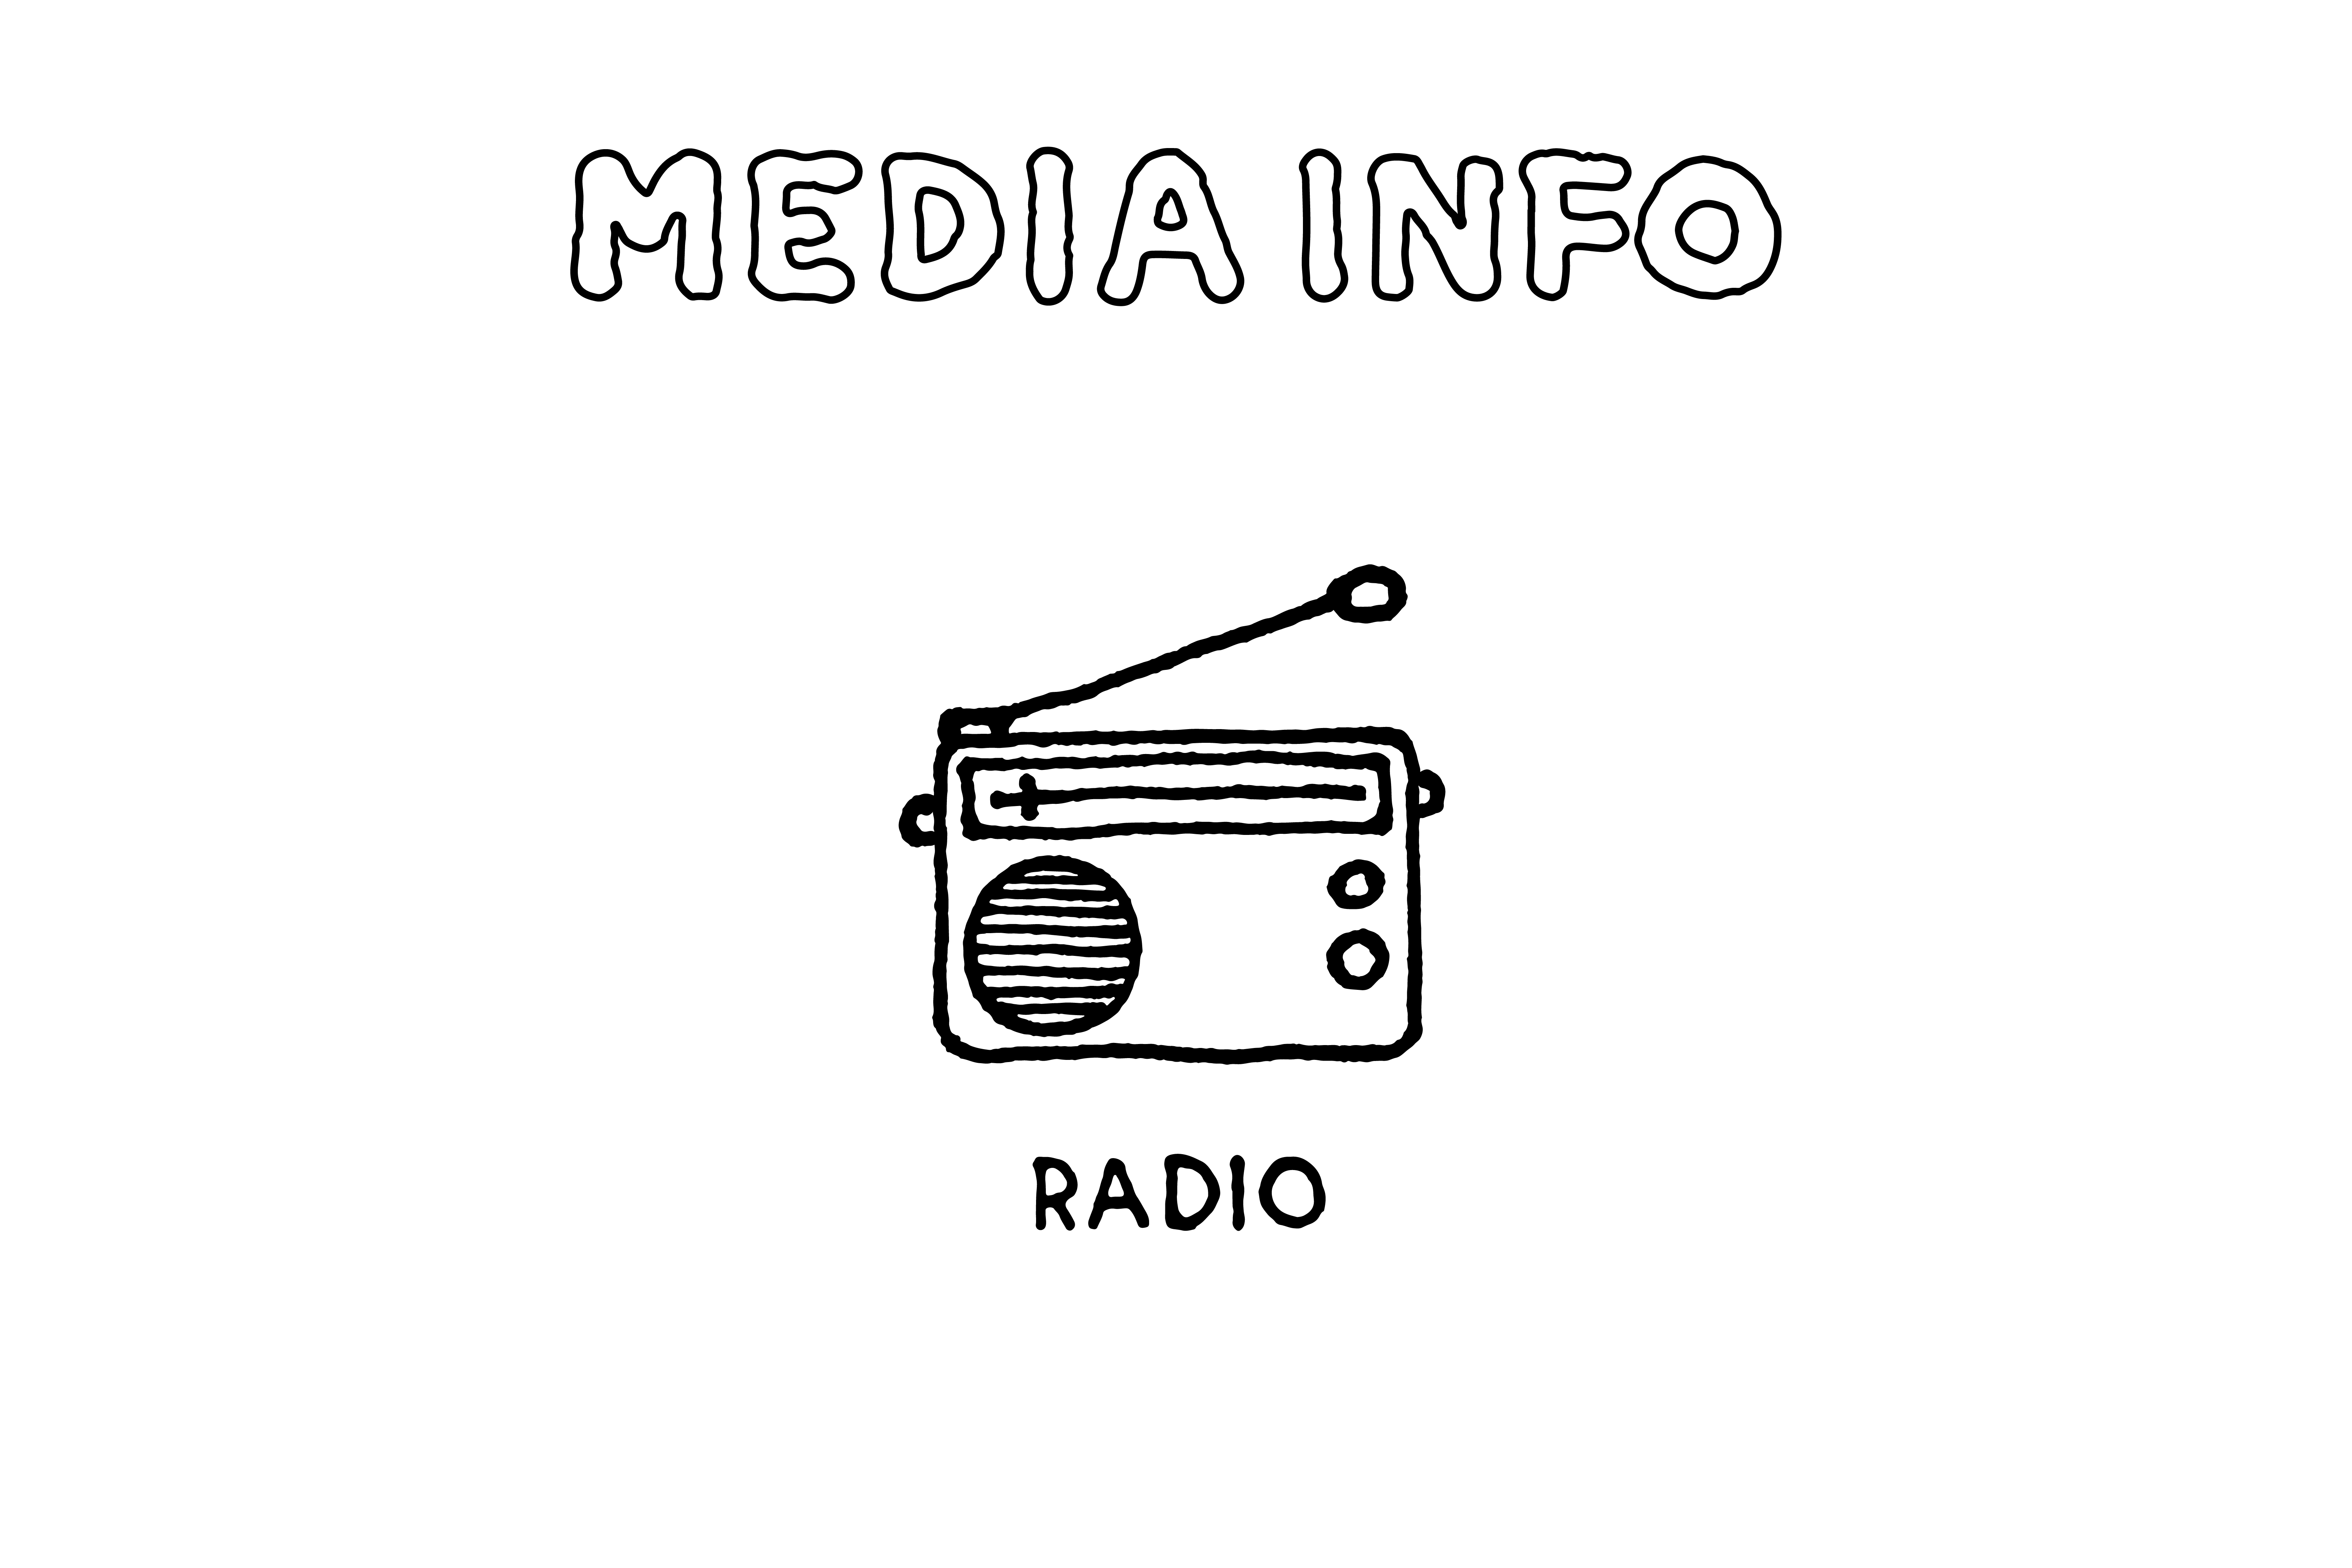 【media info】radio